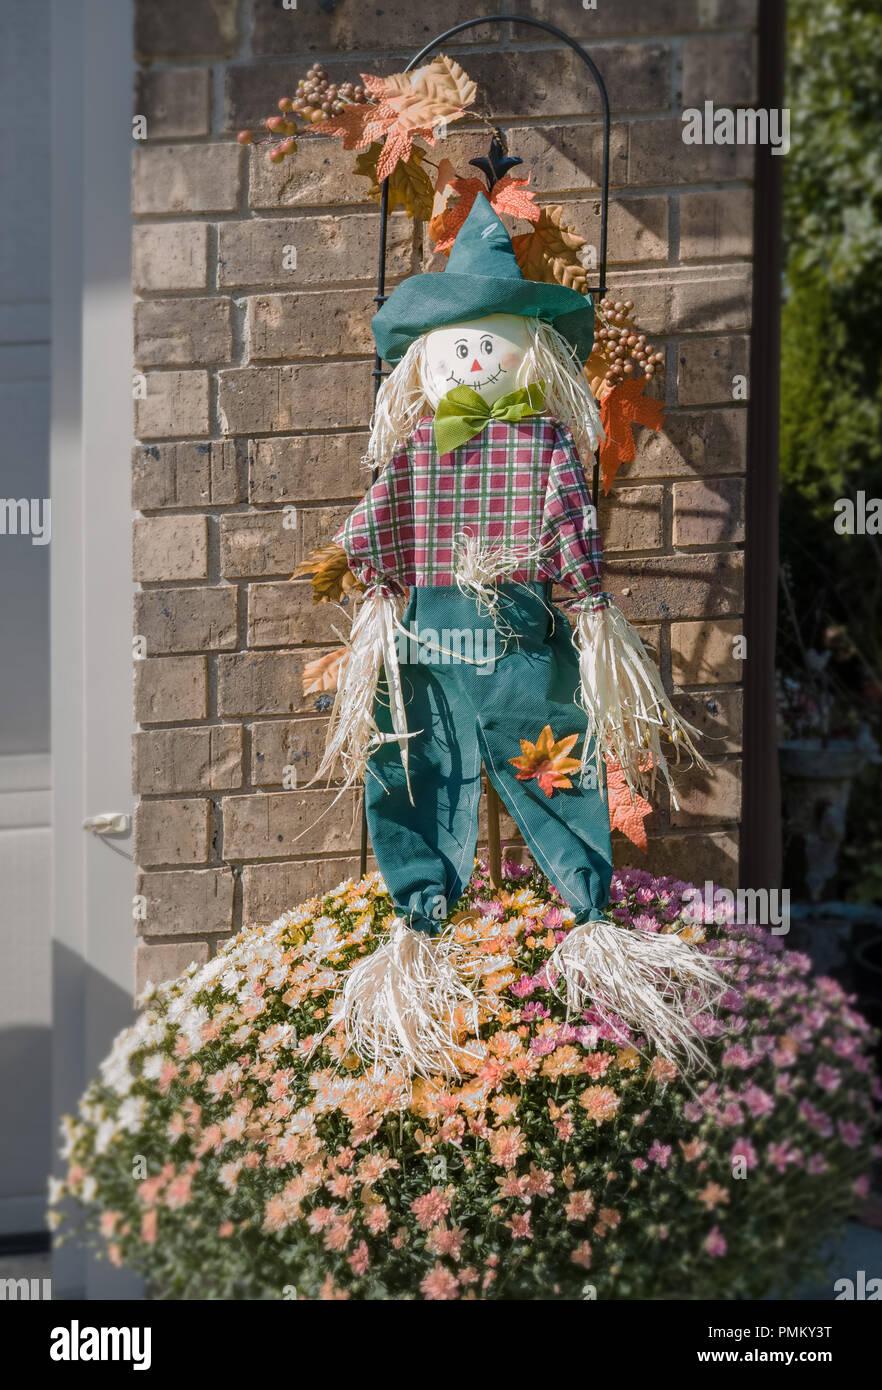 Halloween Dekoration Stroh Scarecrow Vor Dem Haus Stockfotografie Alamy